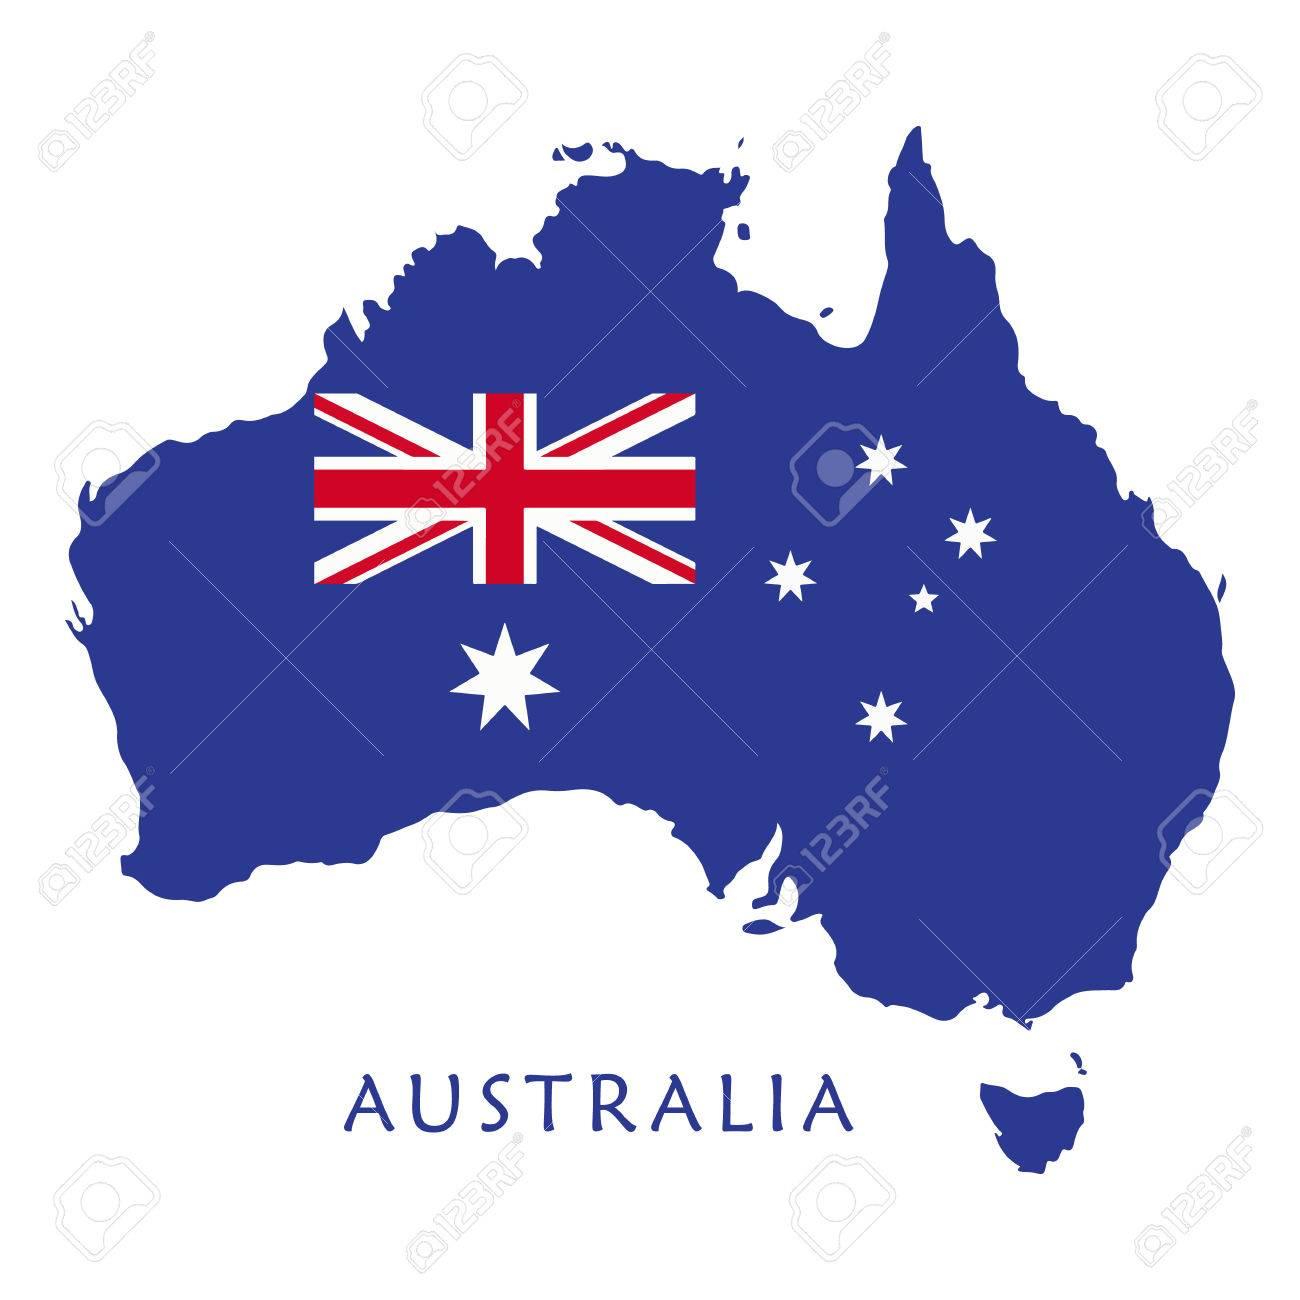 Australia Map Template.Map Australia Blue Map Of Australia With Australian Flag Isolated